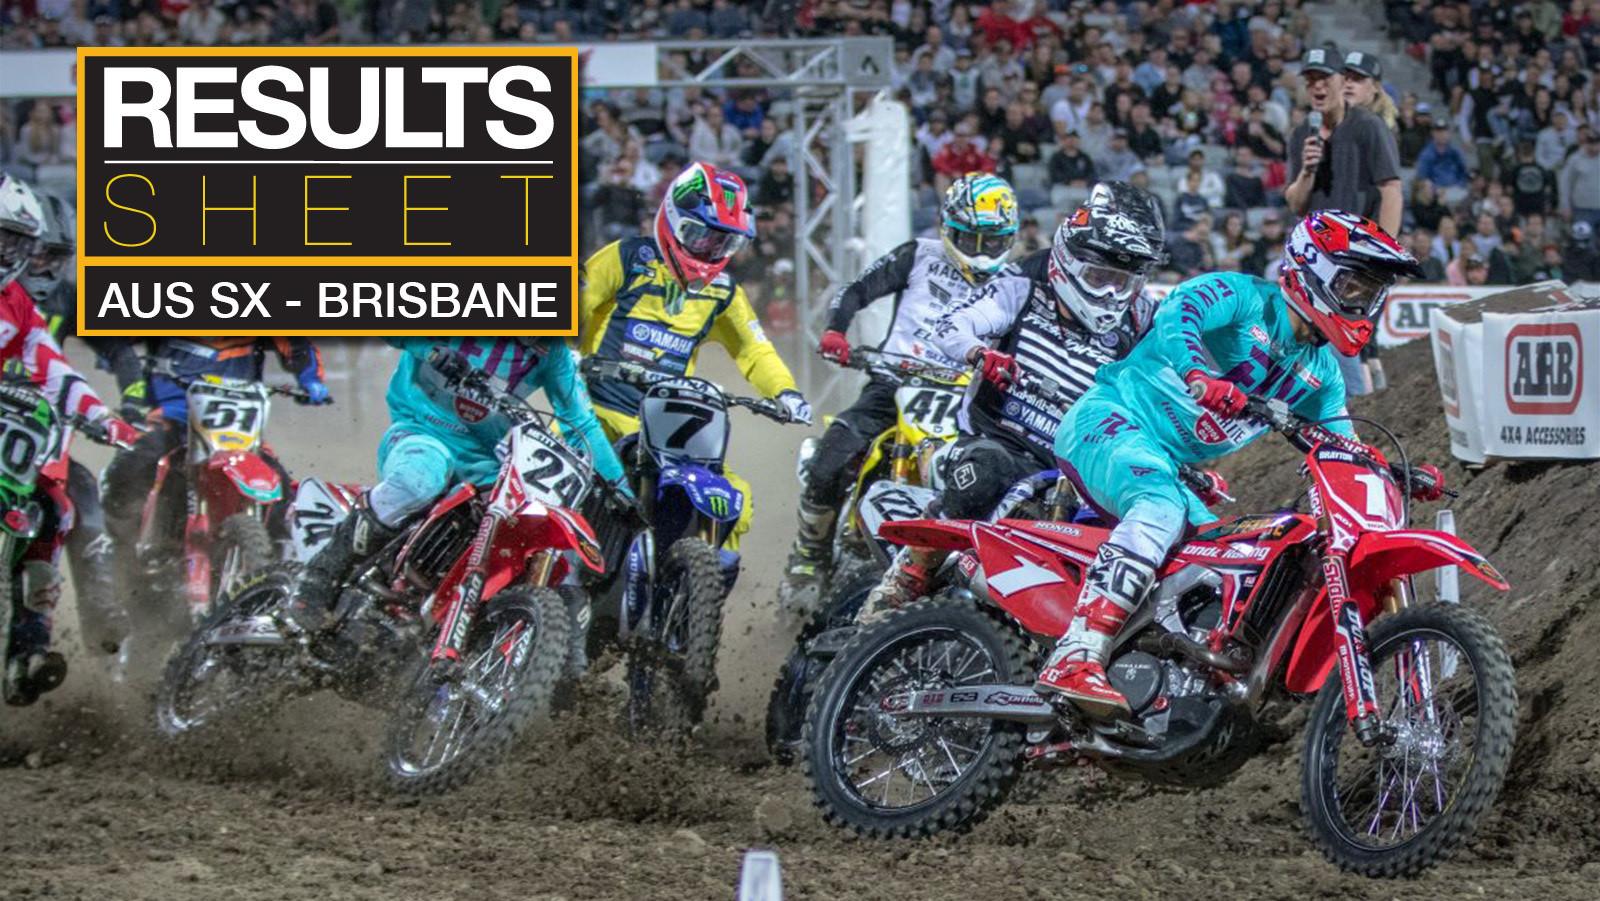 Results Sheet: 2019 Australian Supercross Championship - Round 1